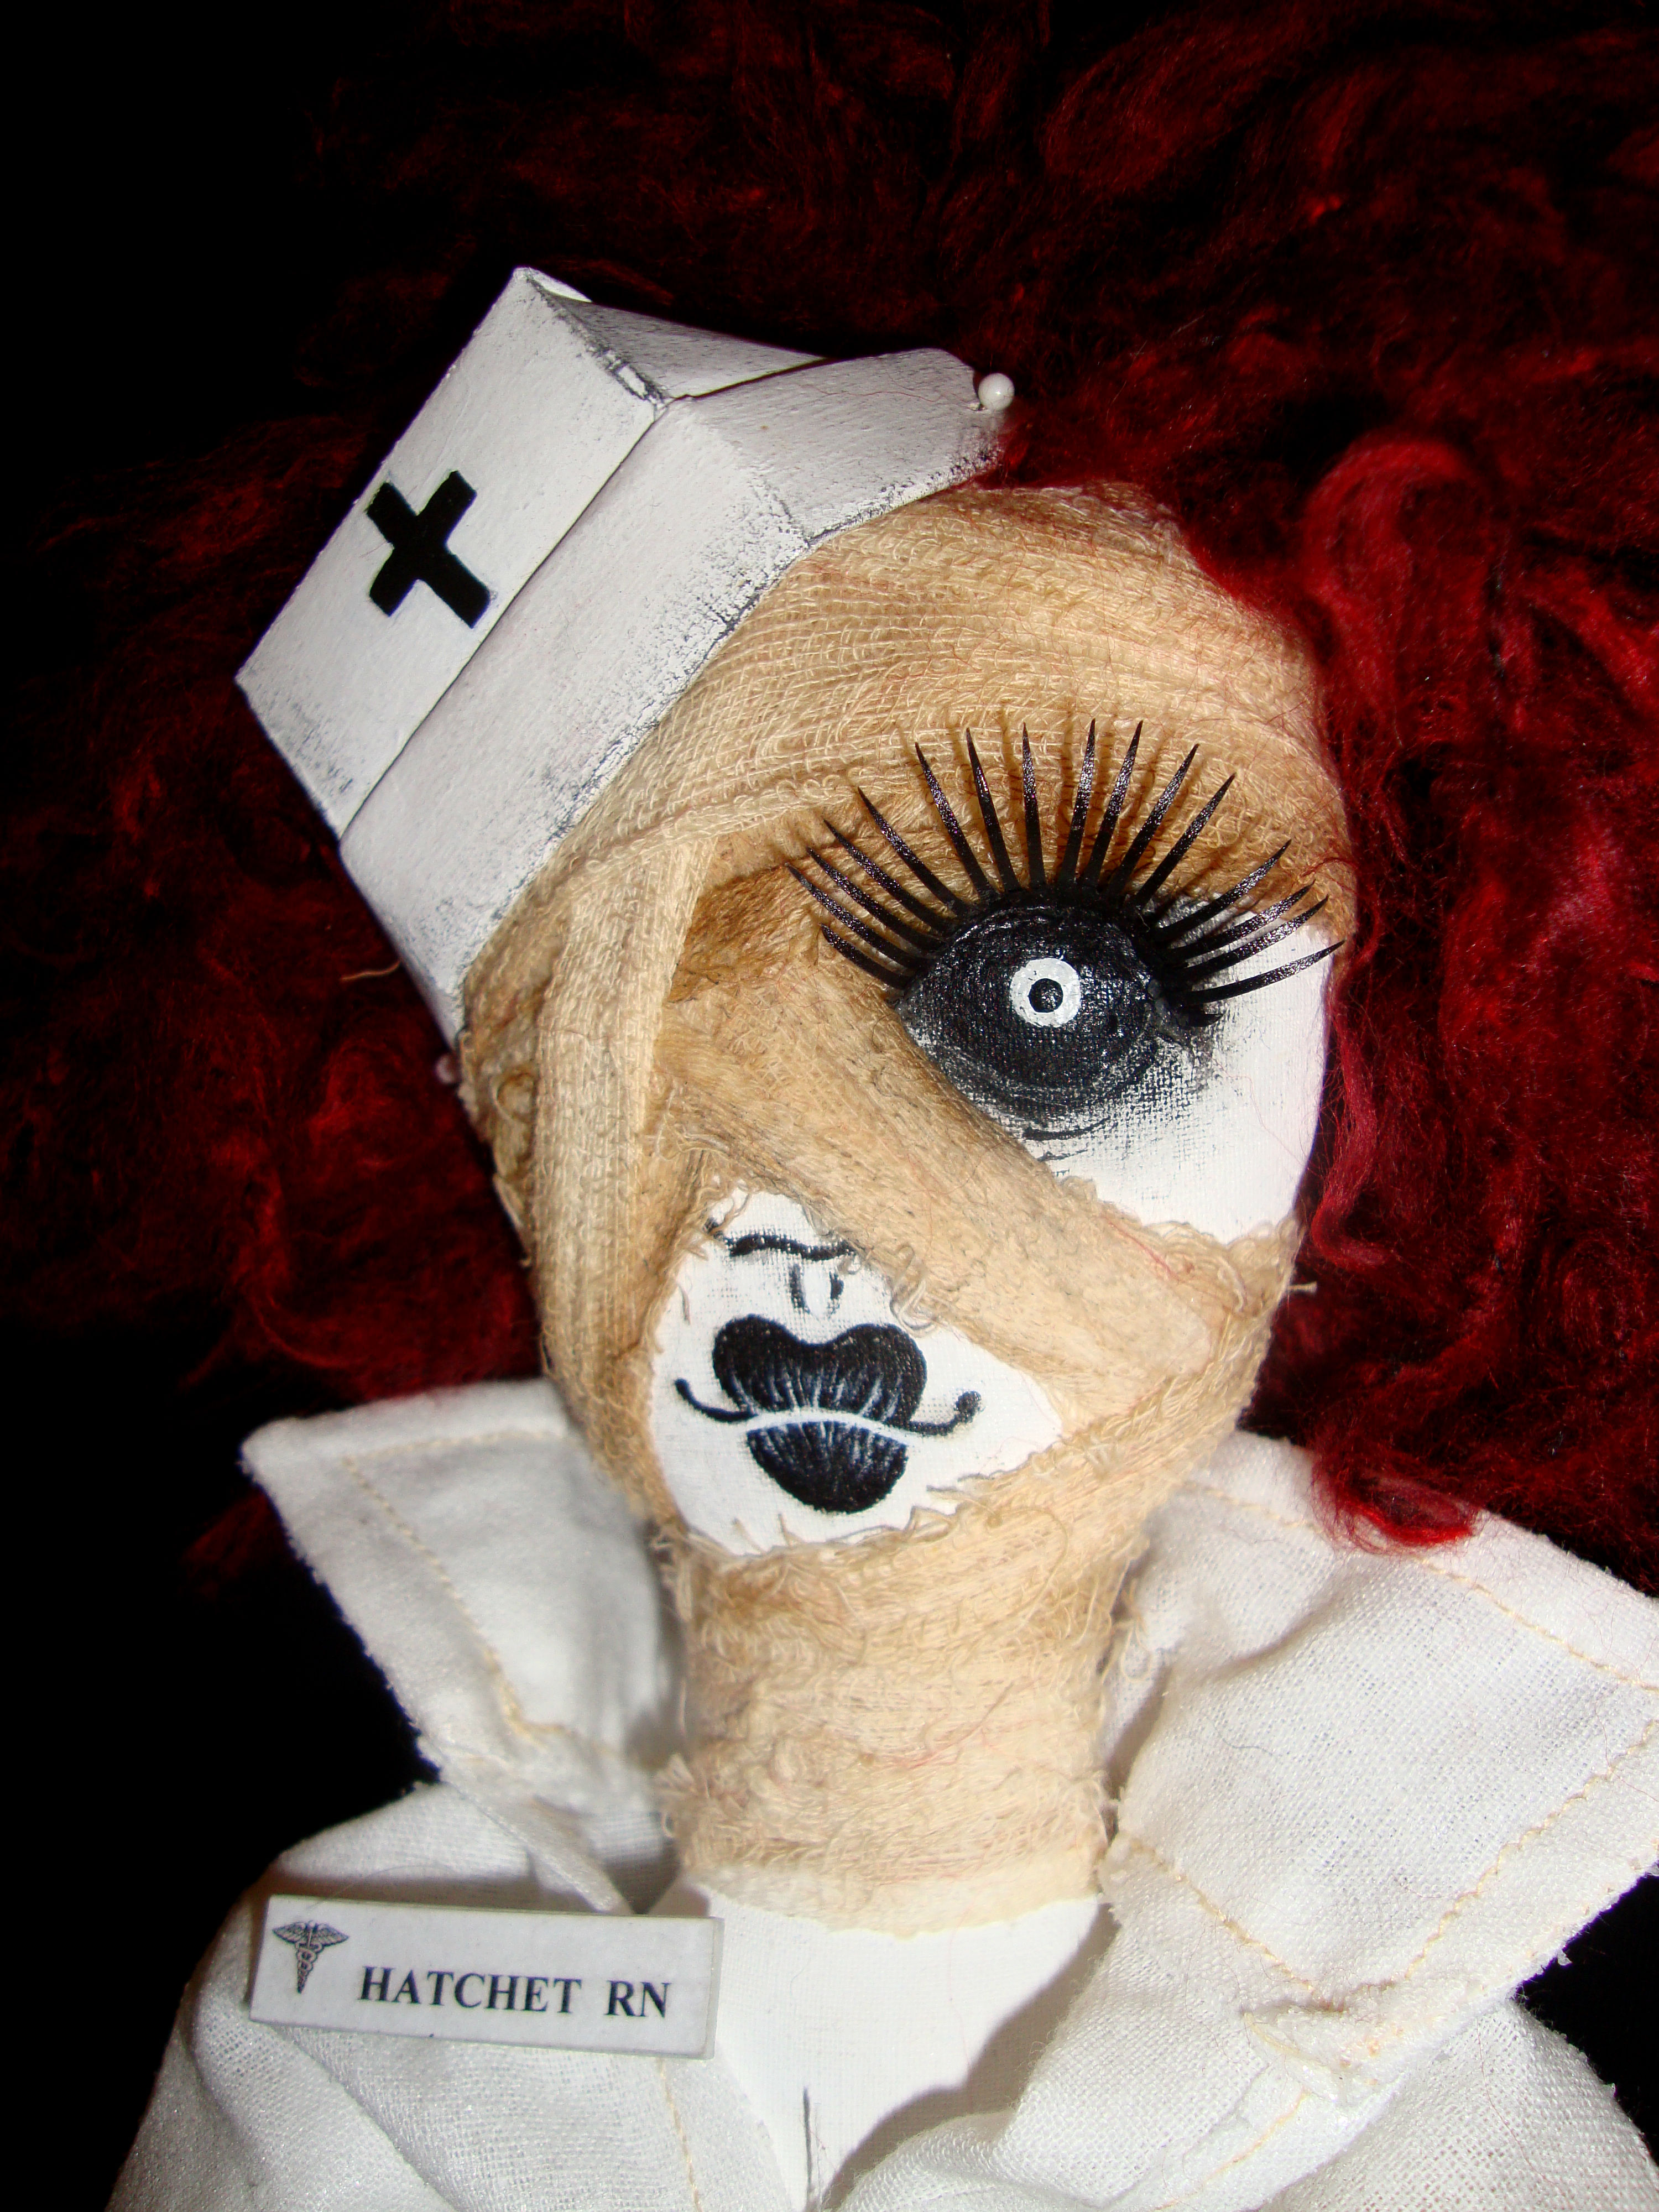 Nurse Hatchet RN